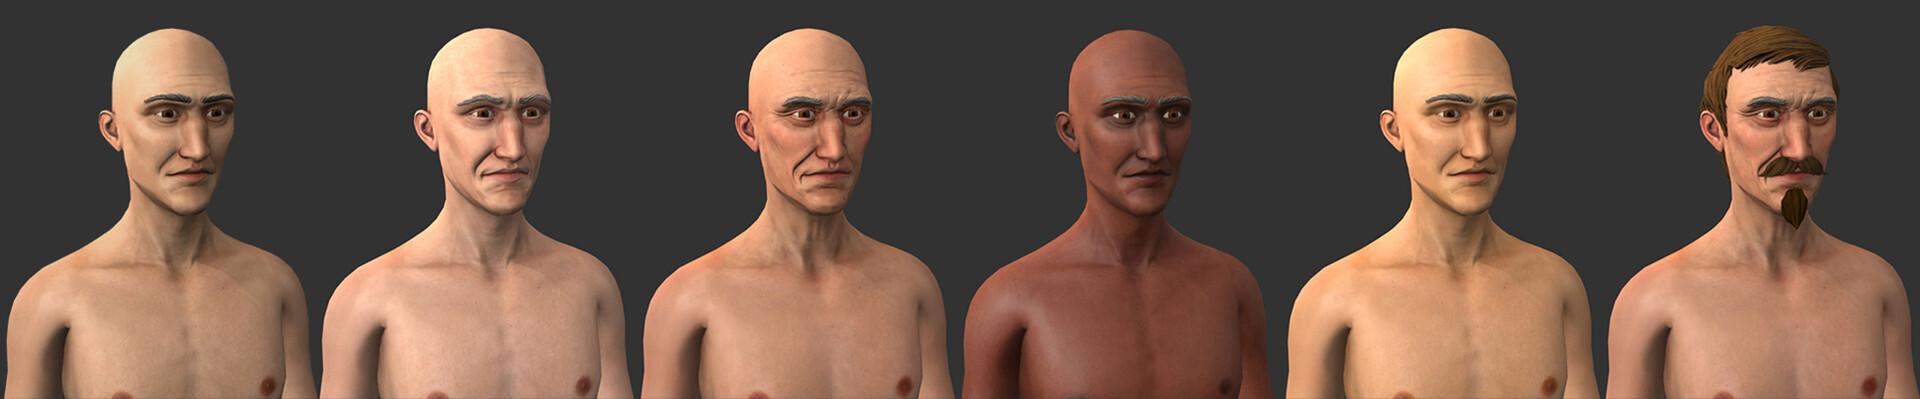 Man skin Variations